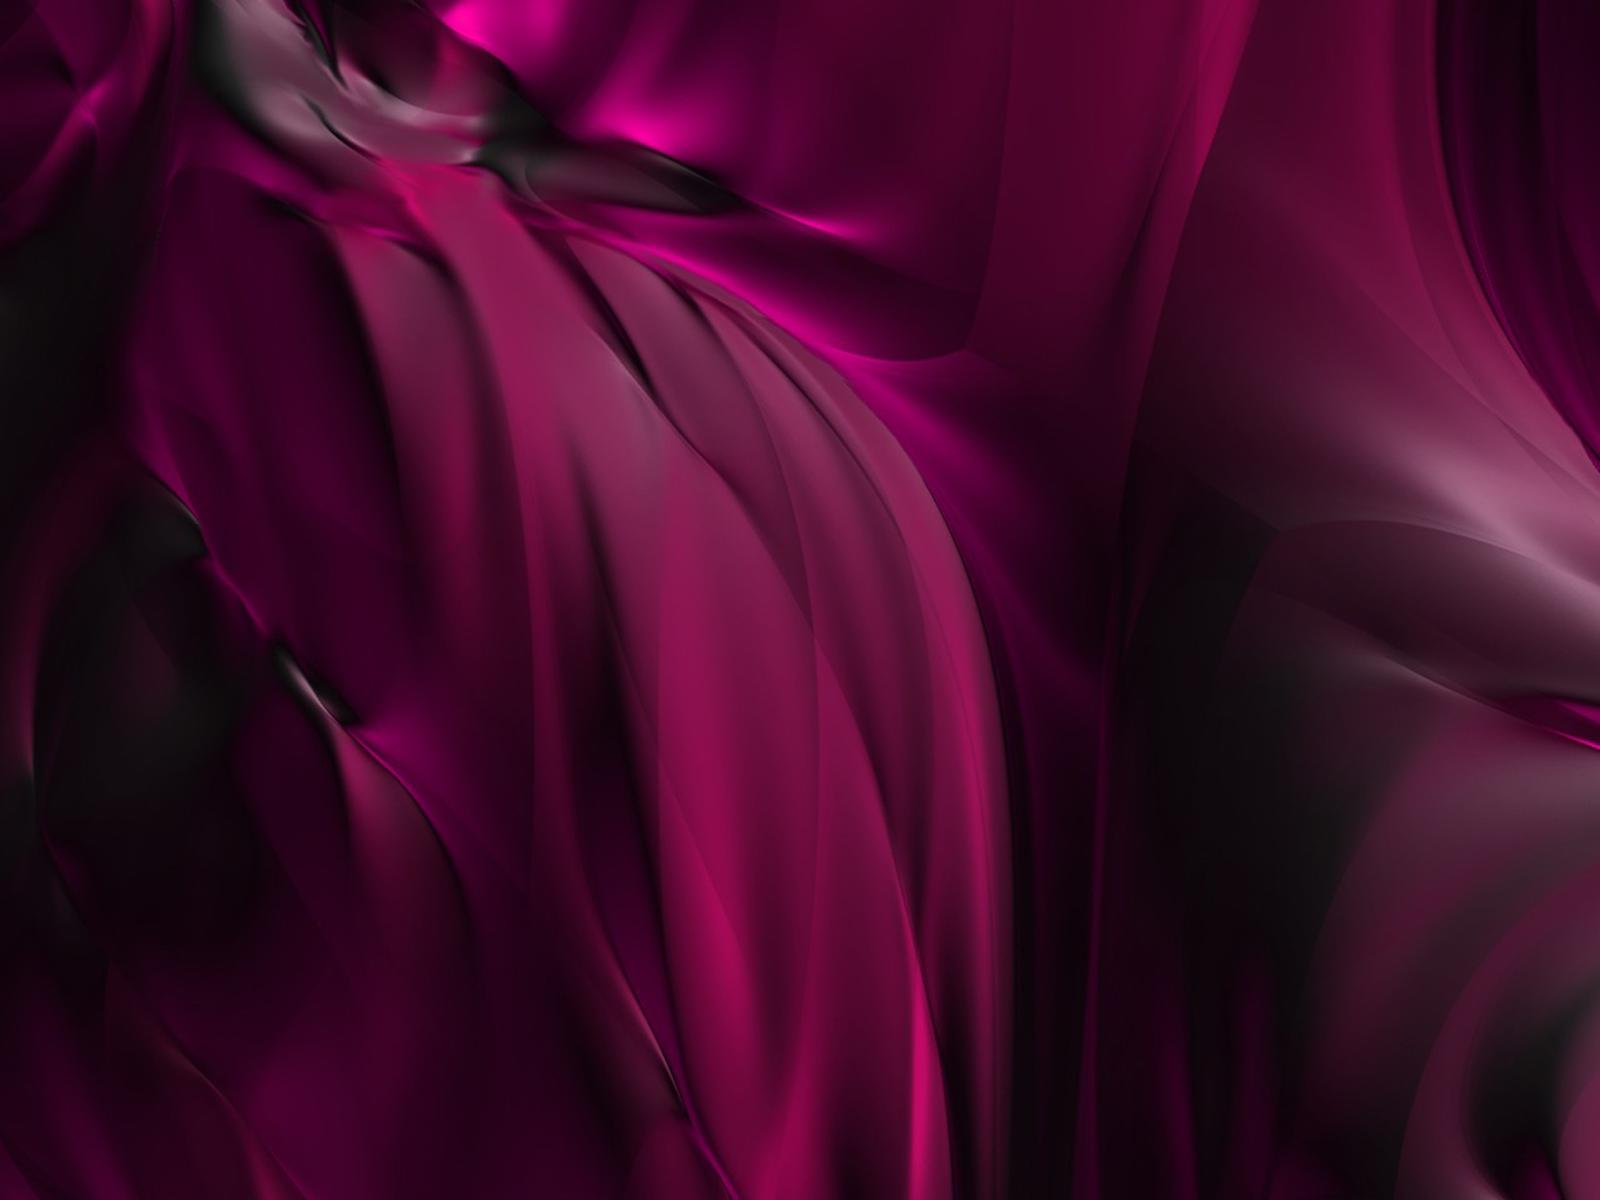 Download desktop wallpaper Purple black and pink stains 1600x1200